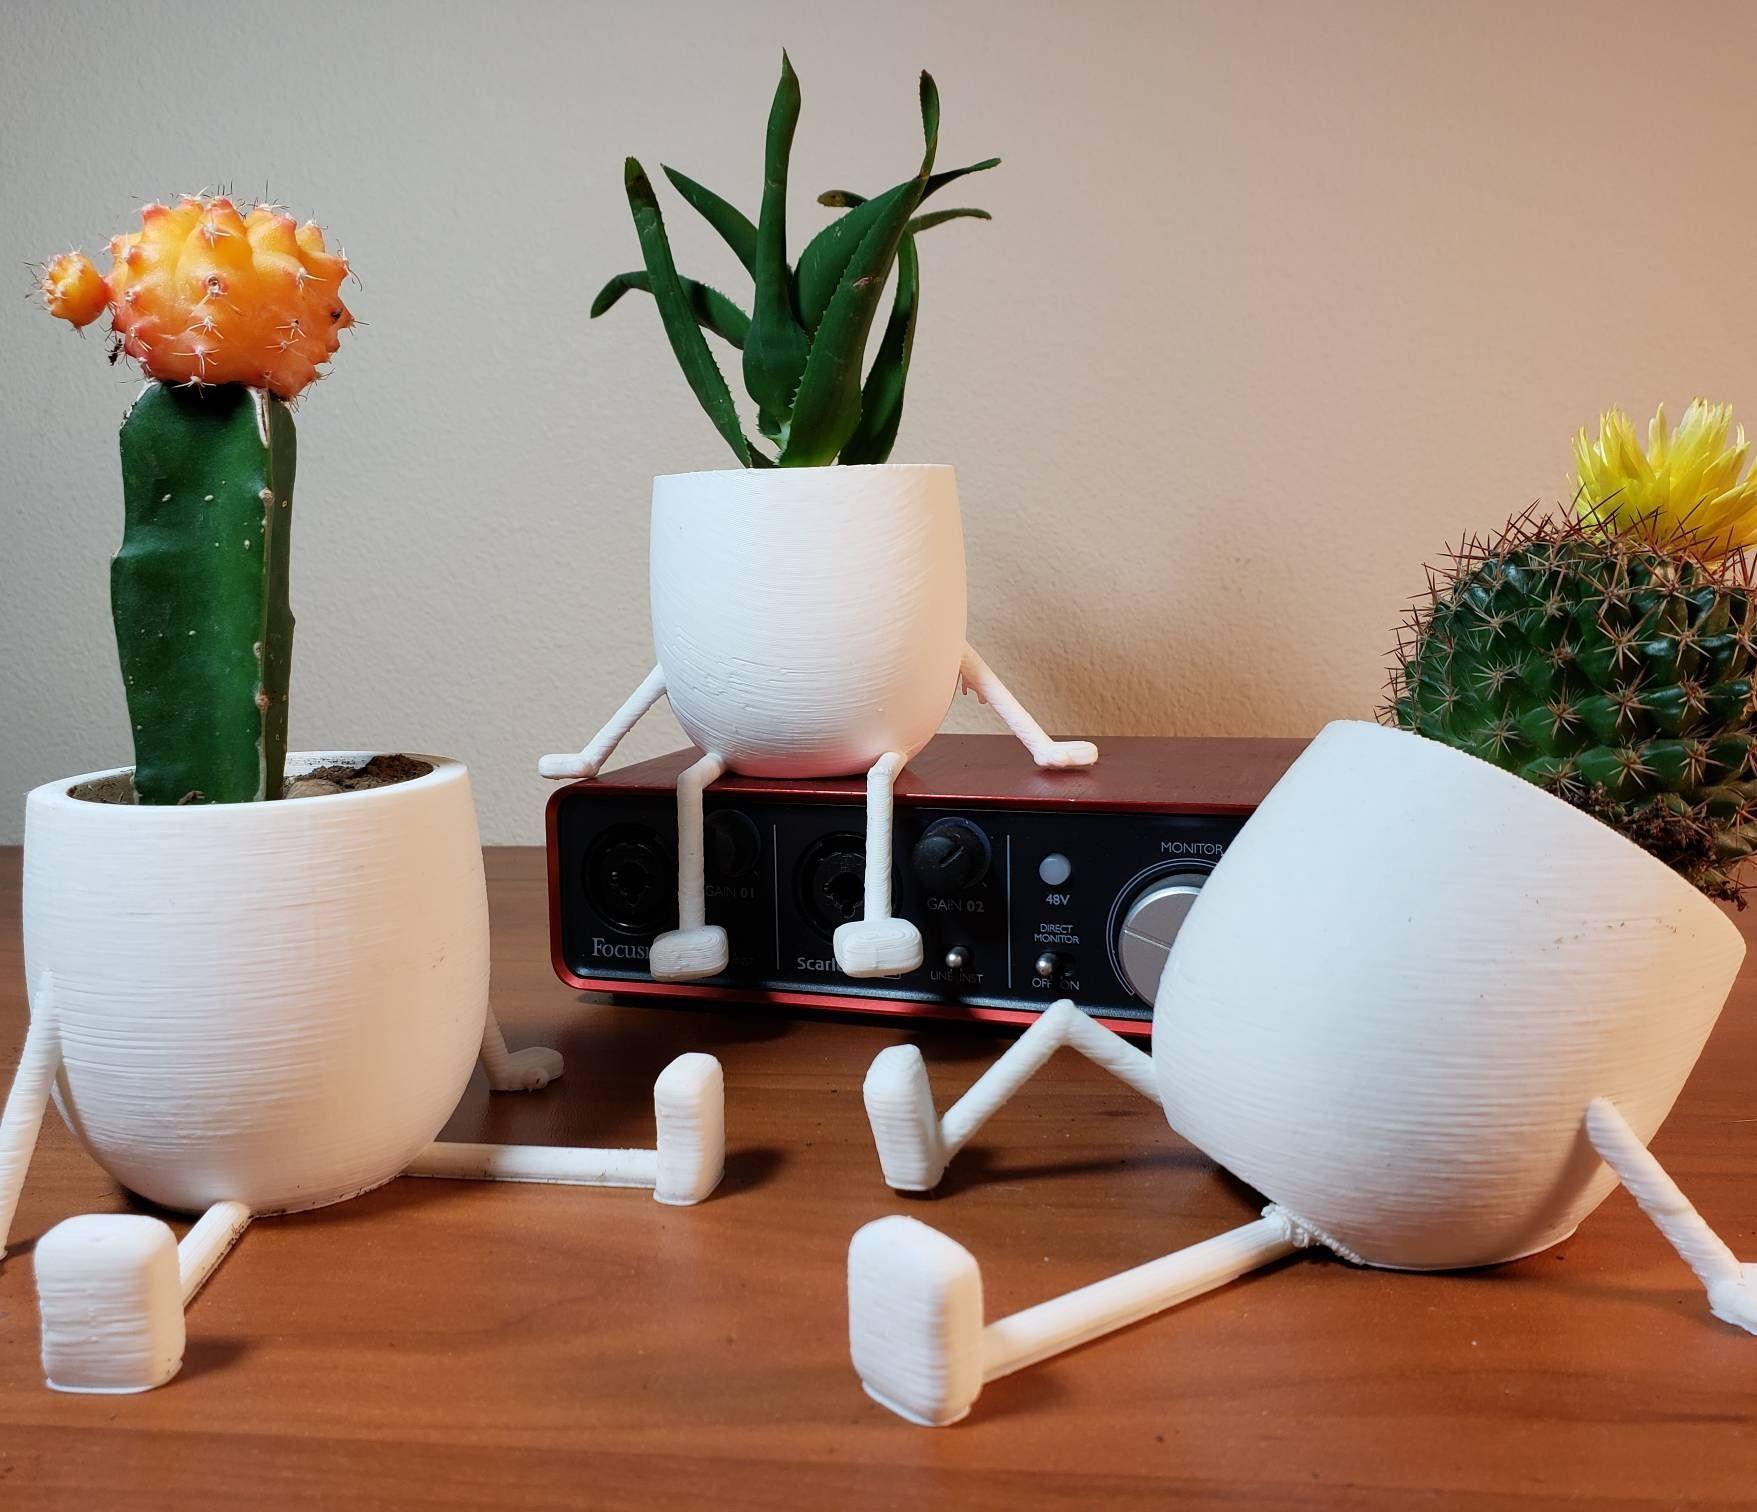 Cute Succulent Planter White Round Planters 3pcs Planter Etsy En 2020 Ideas De Maceta Vasos De Plantas Suculentas Macetas Colgantes